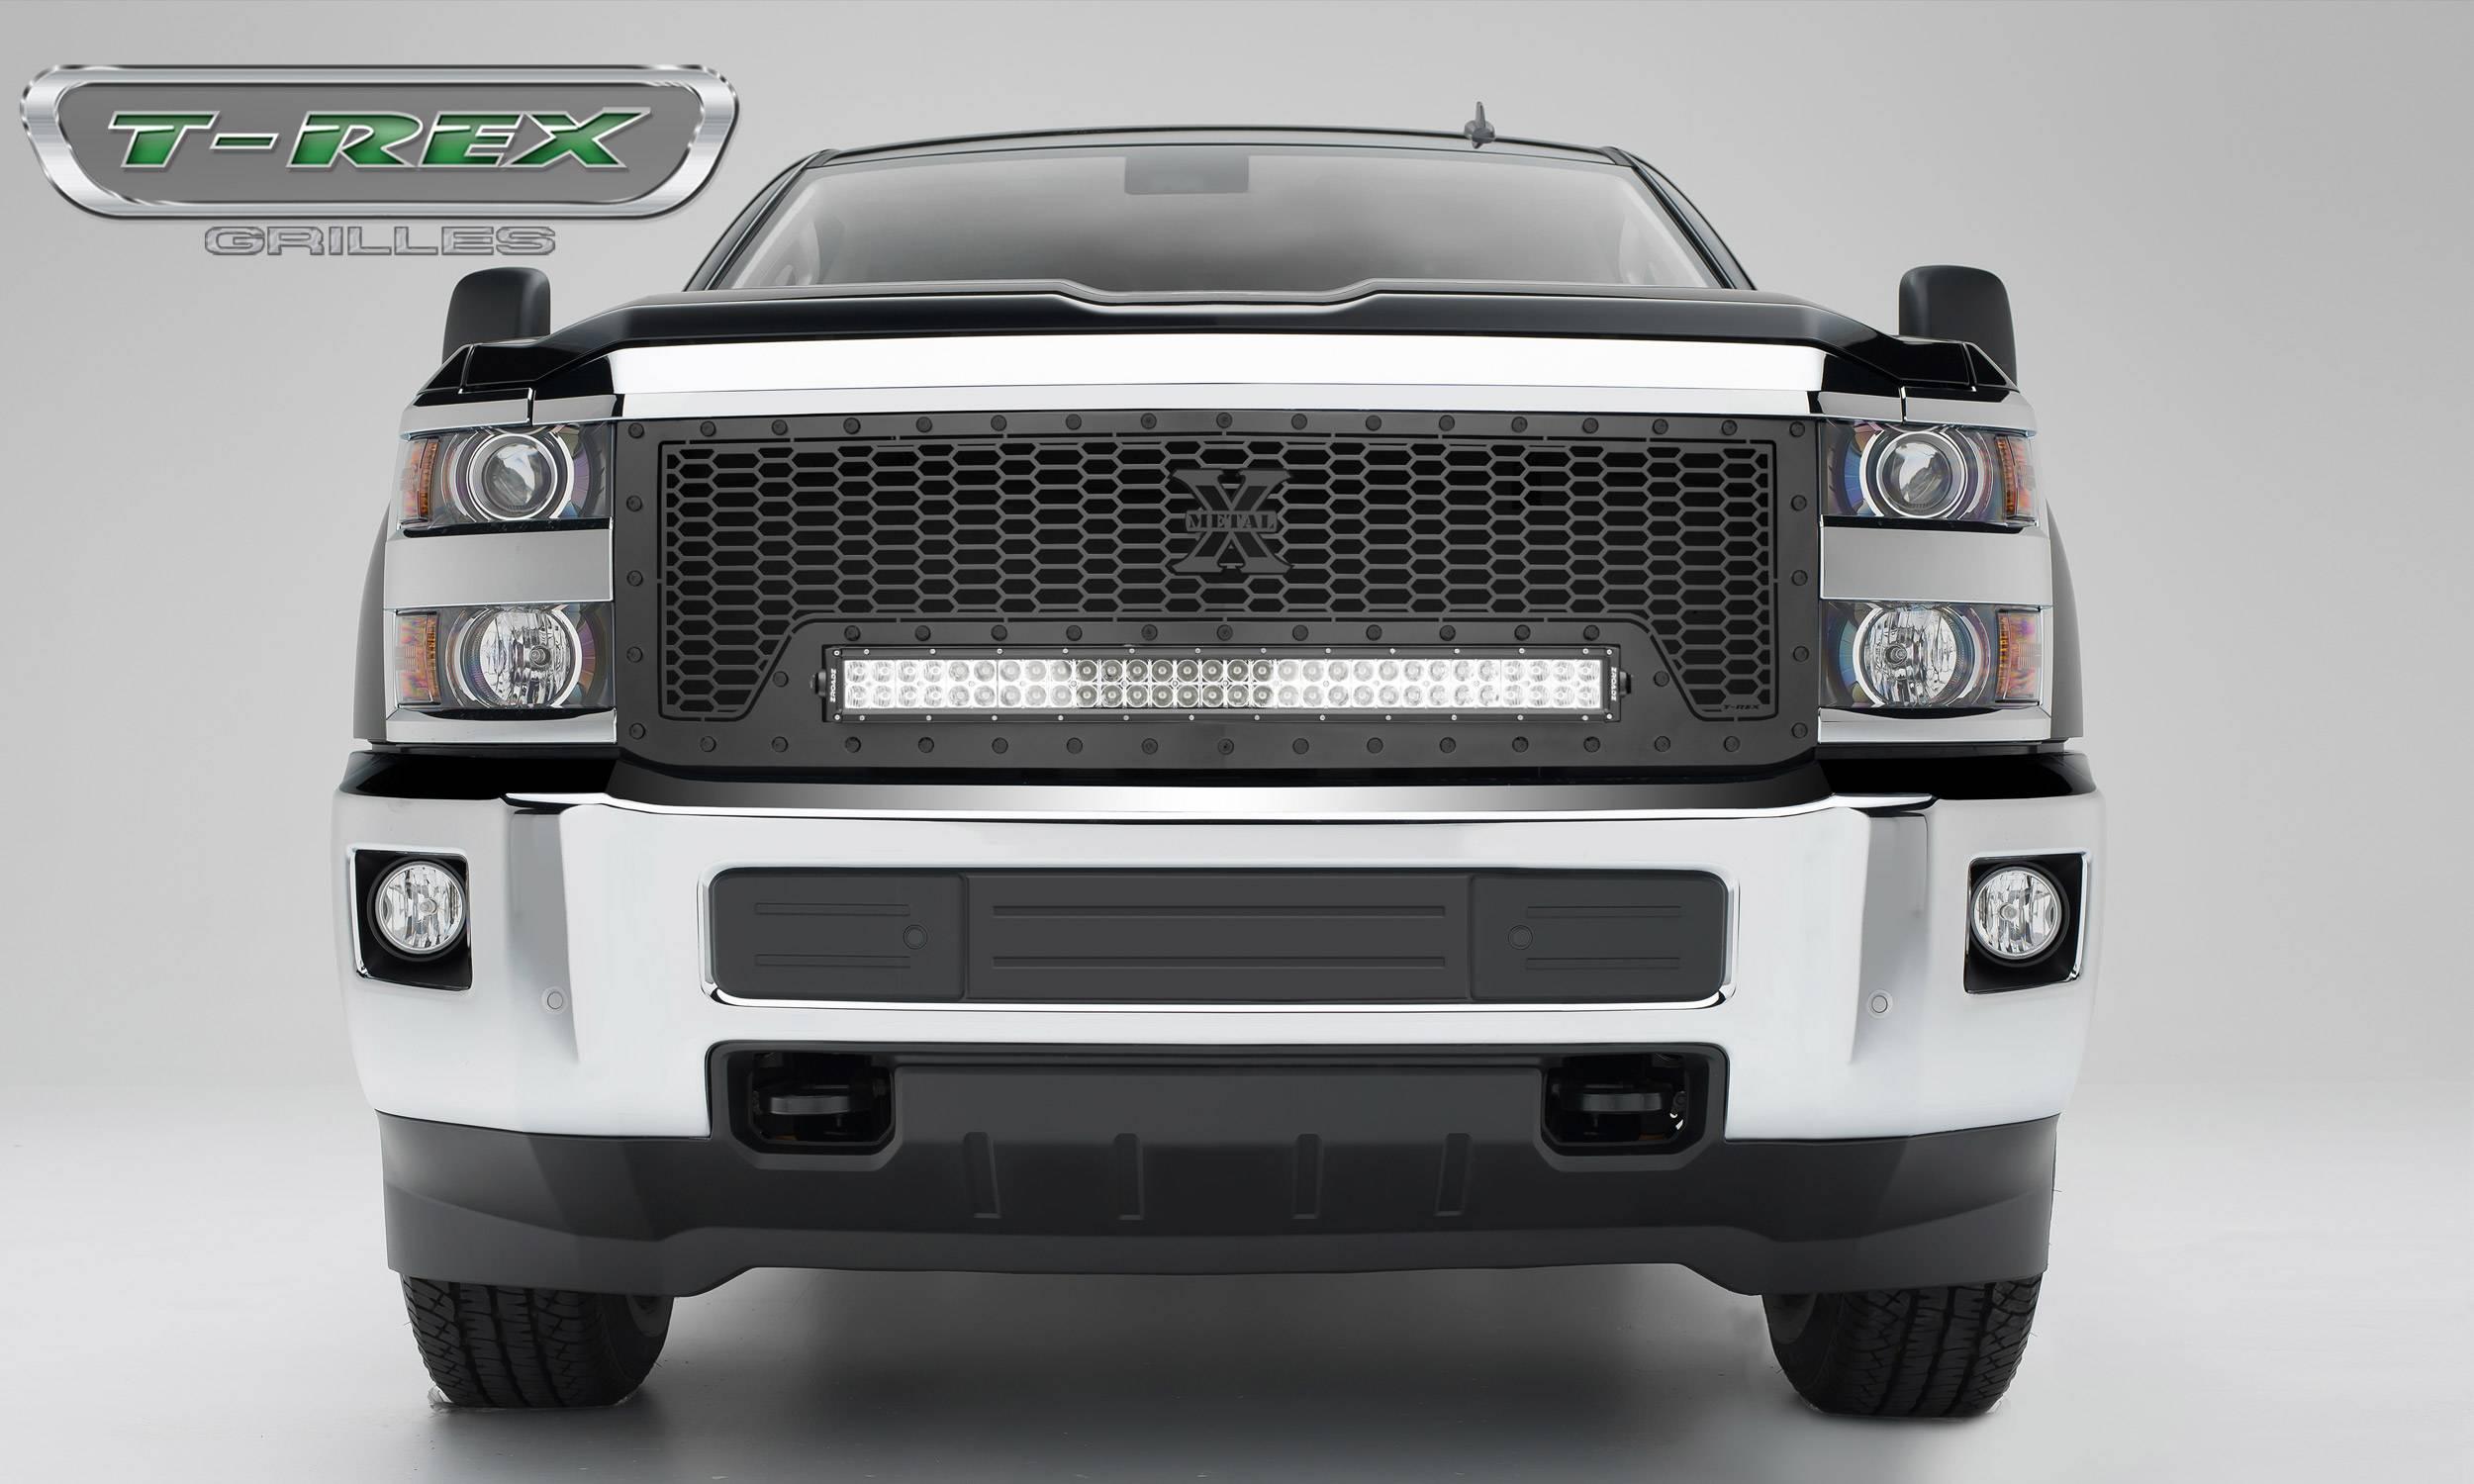 T-REX Grilles - 2015-2019 Chevrolet Silverado HD Stealth Laser Torch Grille, Black, Mild Steel, 1 Pc, Replacement -#7311241-BR